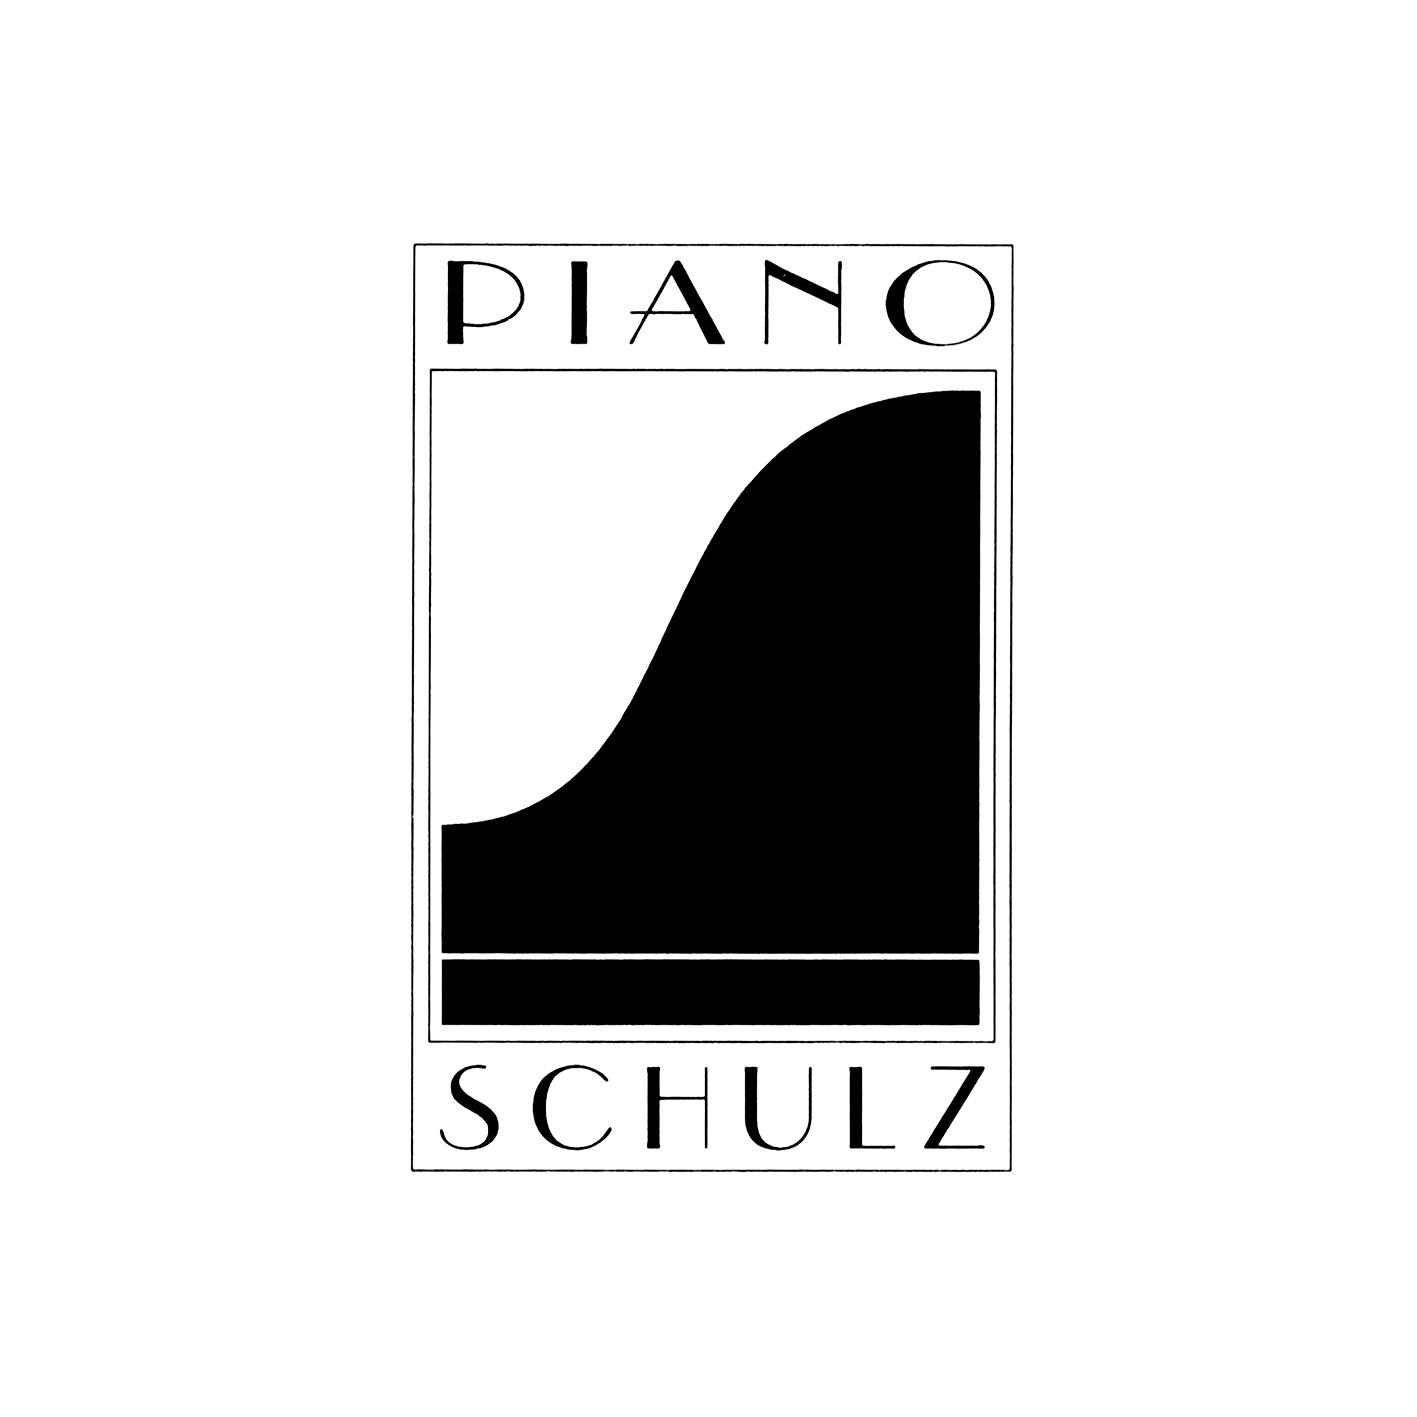 pianoschulz logo graphis